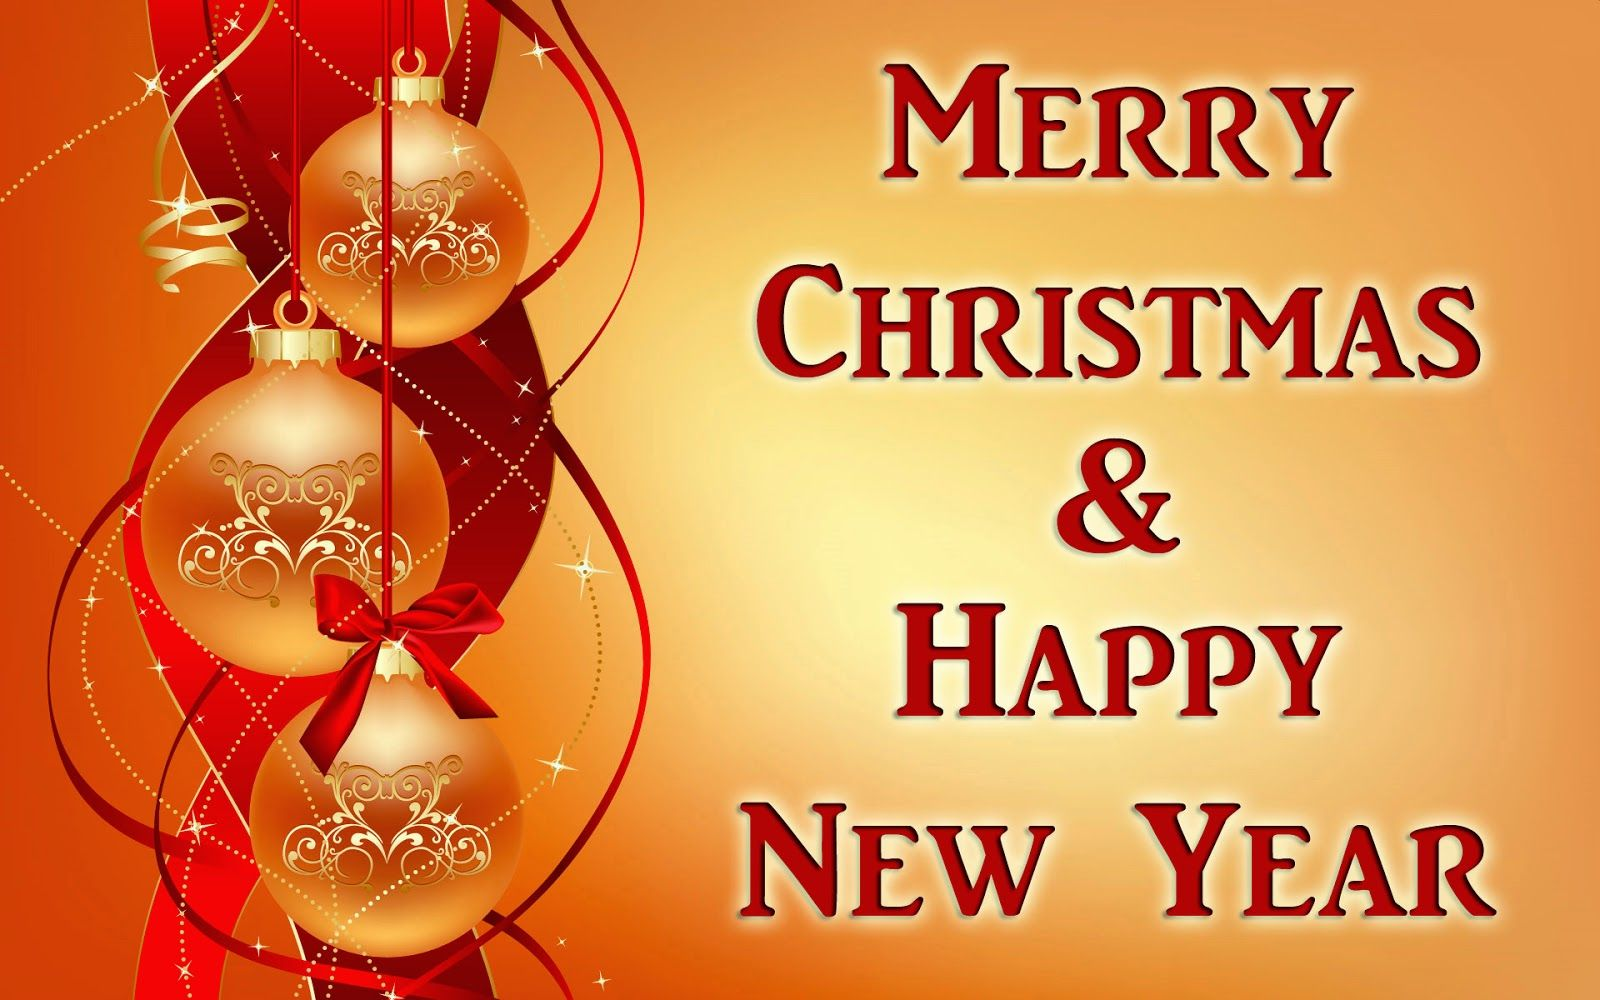 Happy New Year Greetings 206 Happy New Year Christmas Greetings